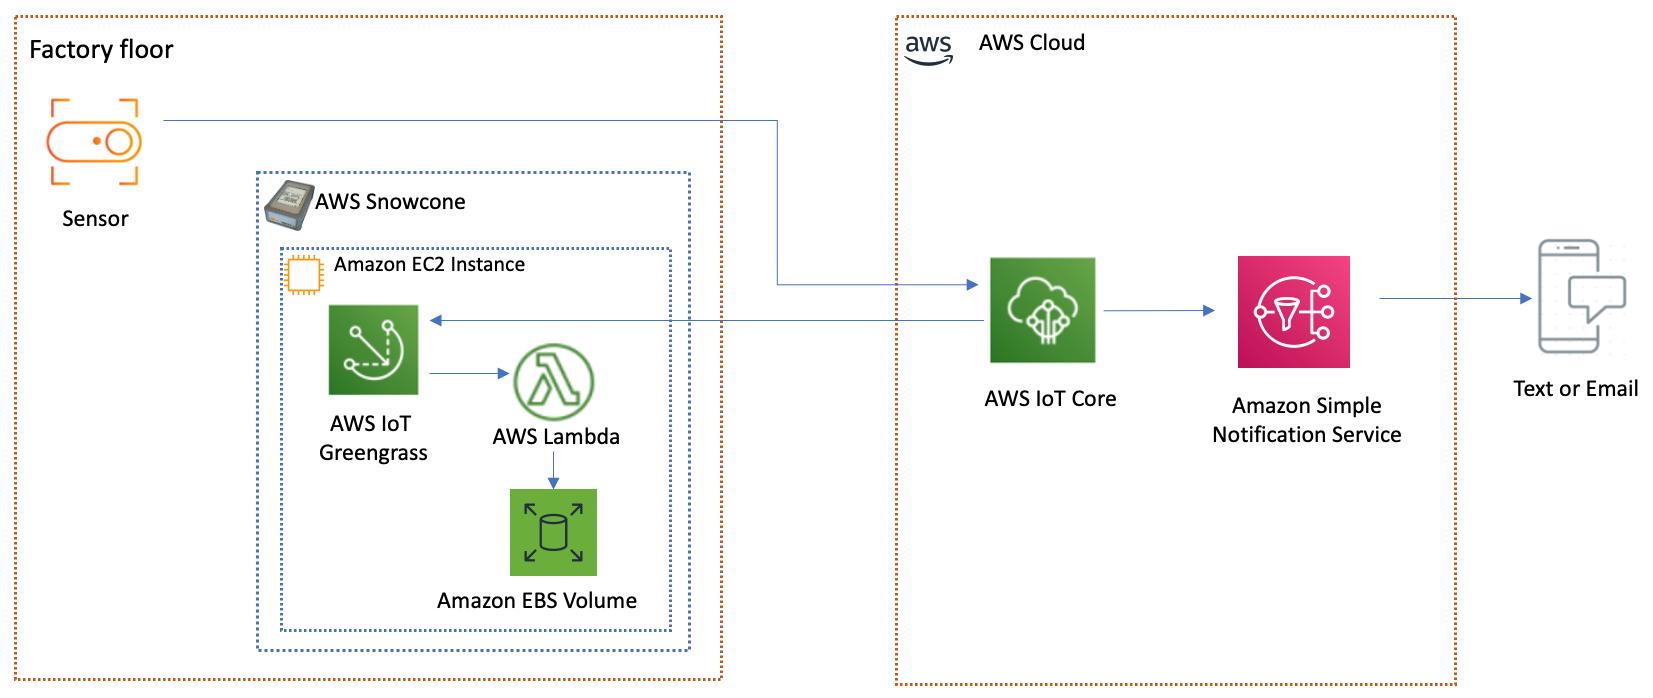 Simplify sensor workflow with AWS IoT Greengrass and AWS Lambda